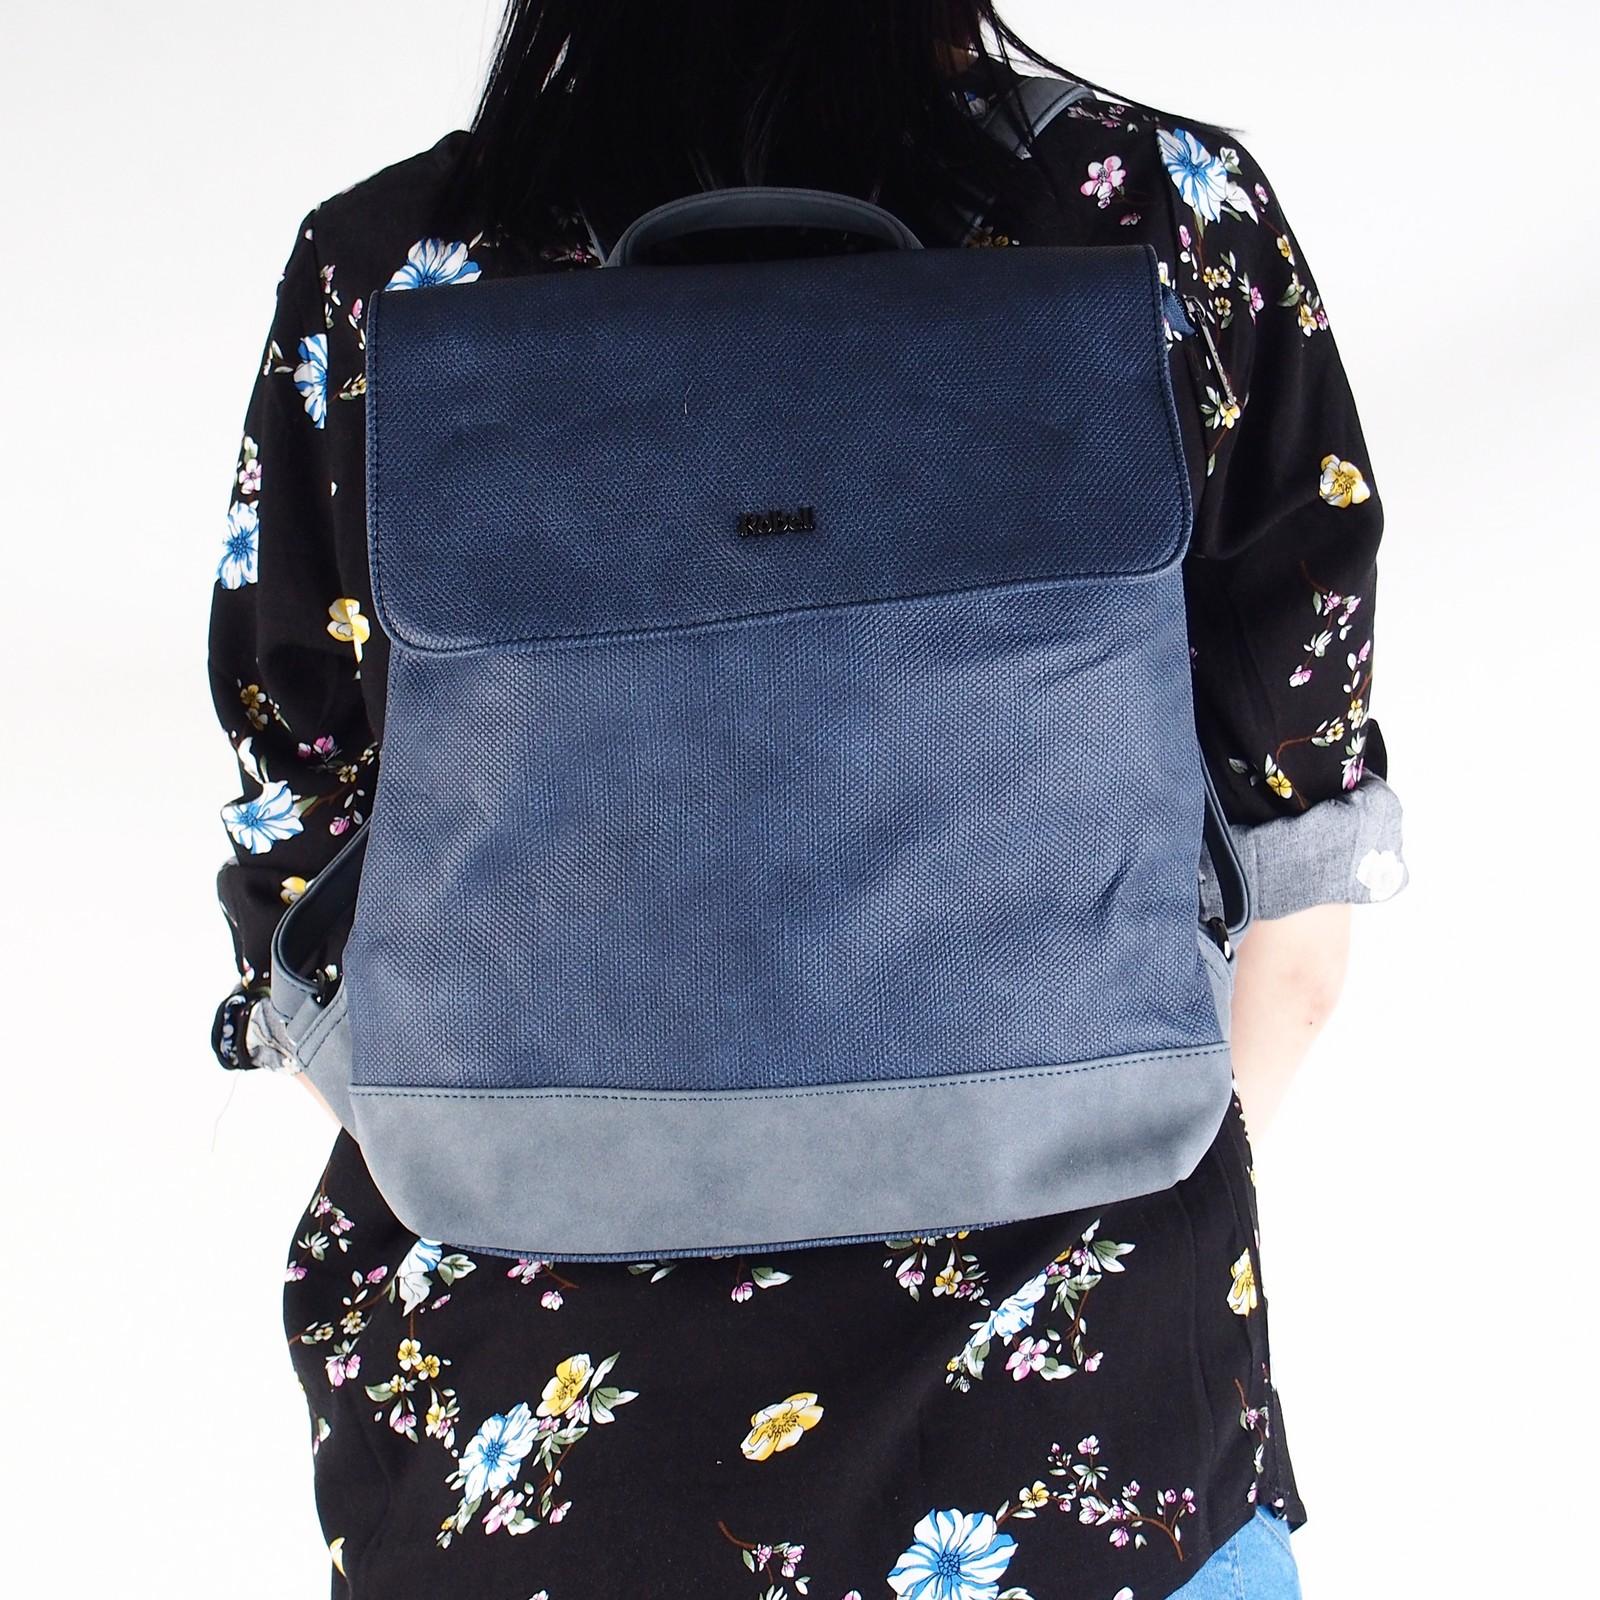 Robel dámsky štýlový ruksak - modrý ... ff90d689eb